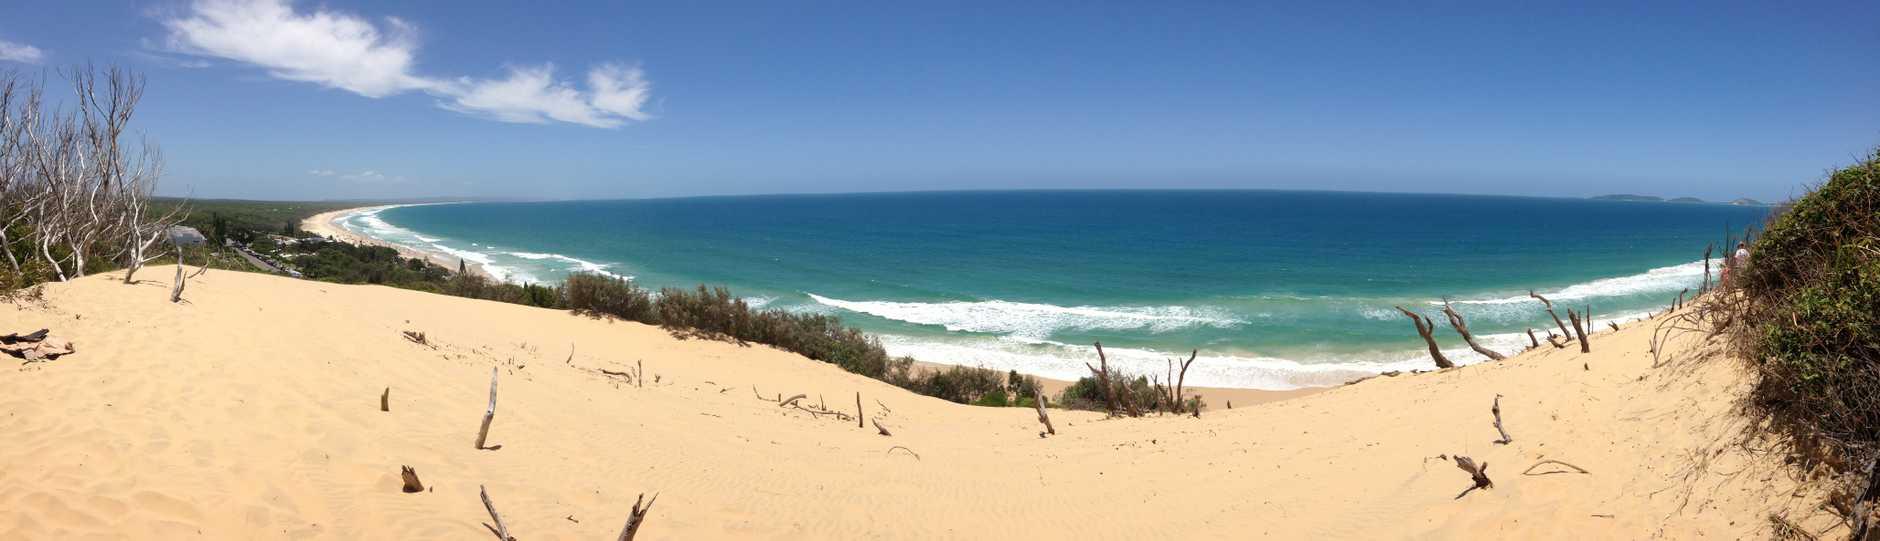 Rainbow Beach - Sand Dune Stuart Rawlins - User Contributed